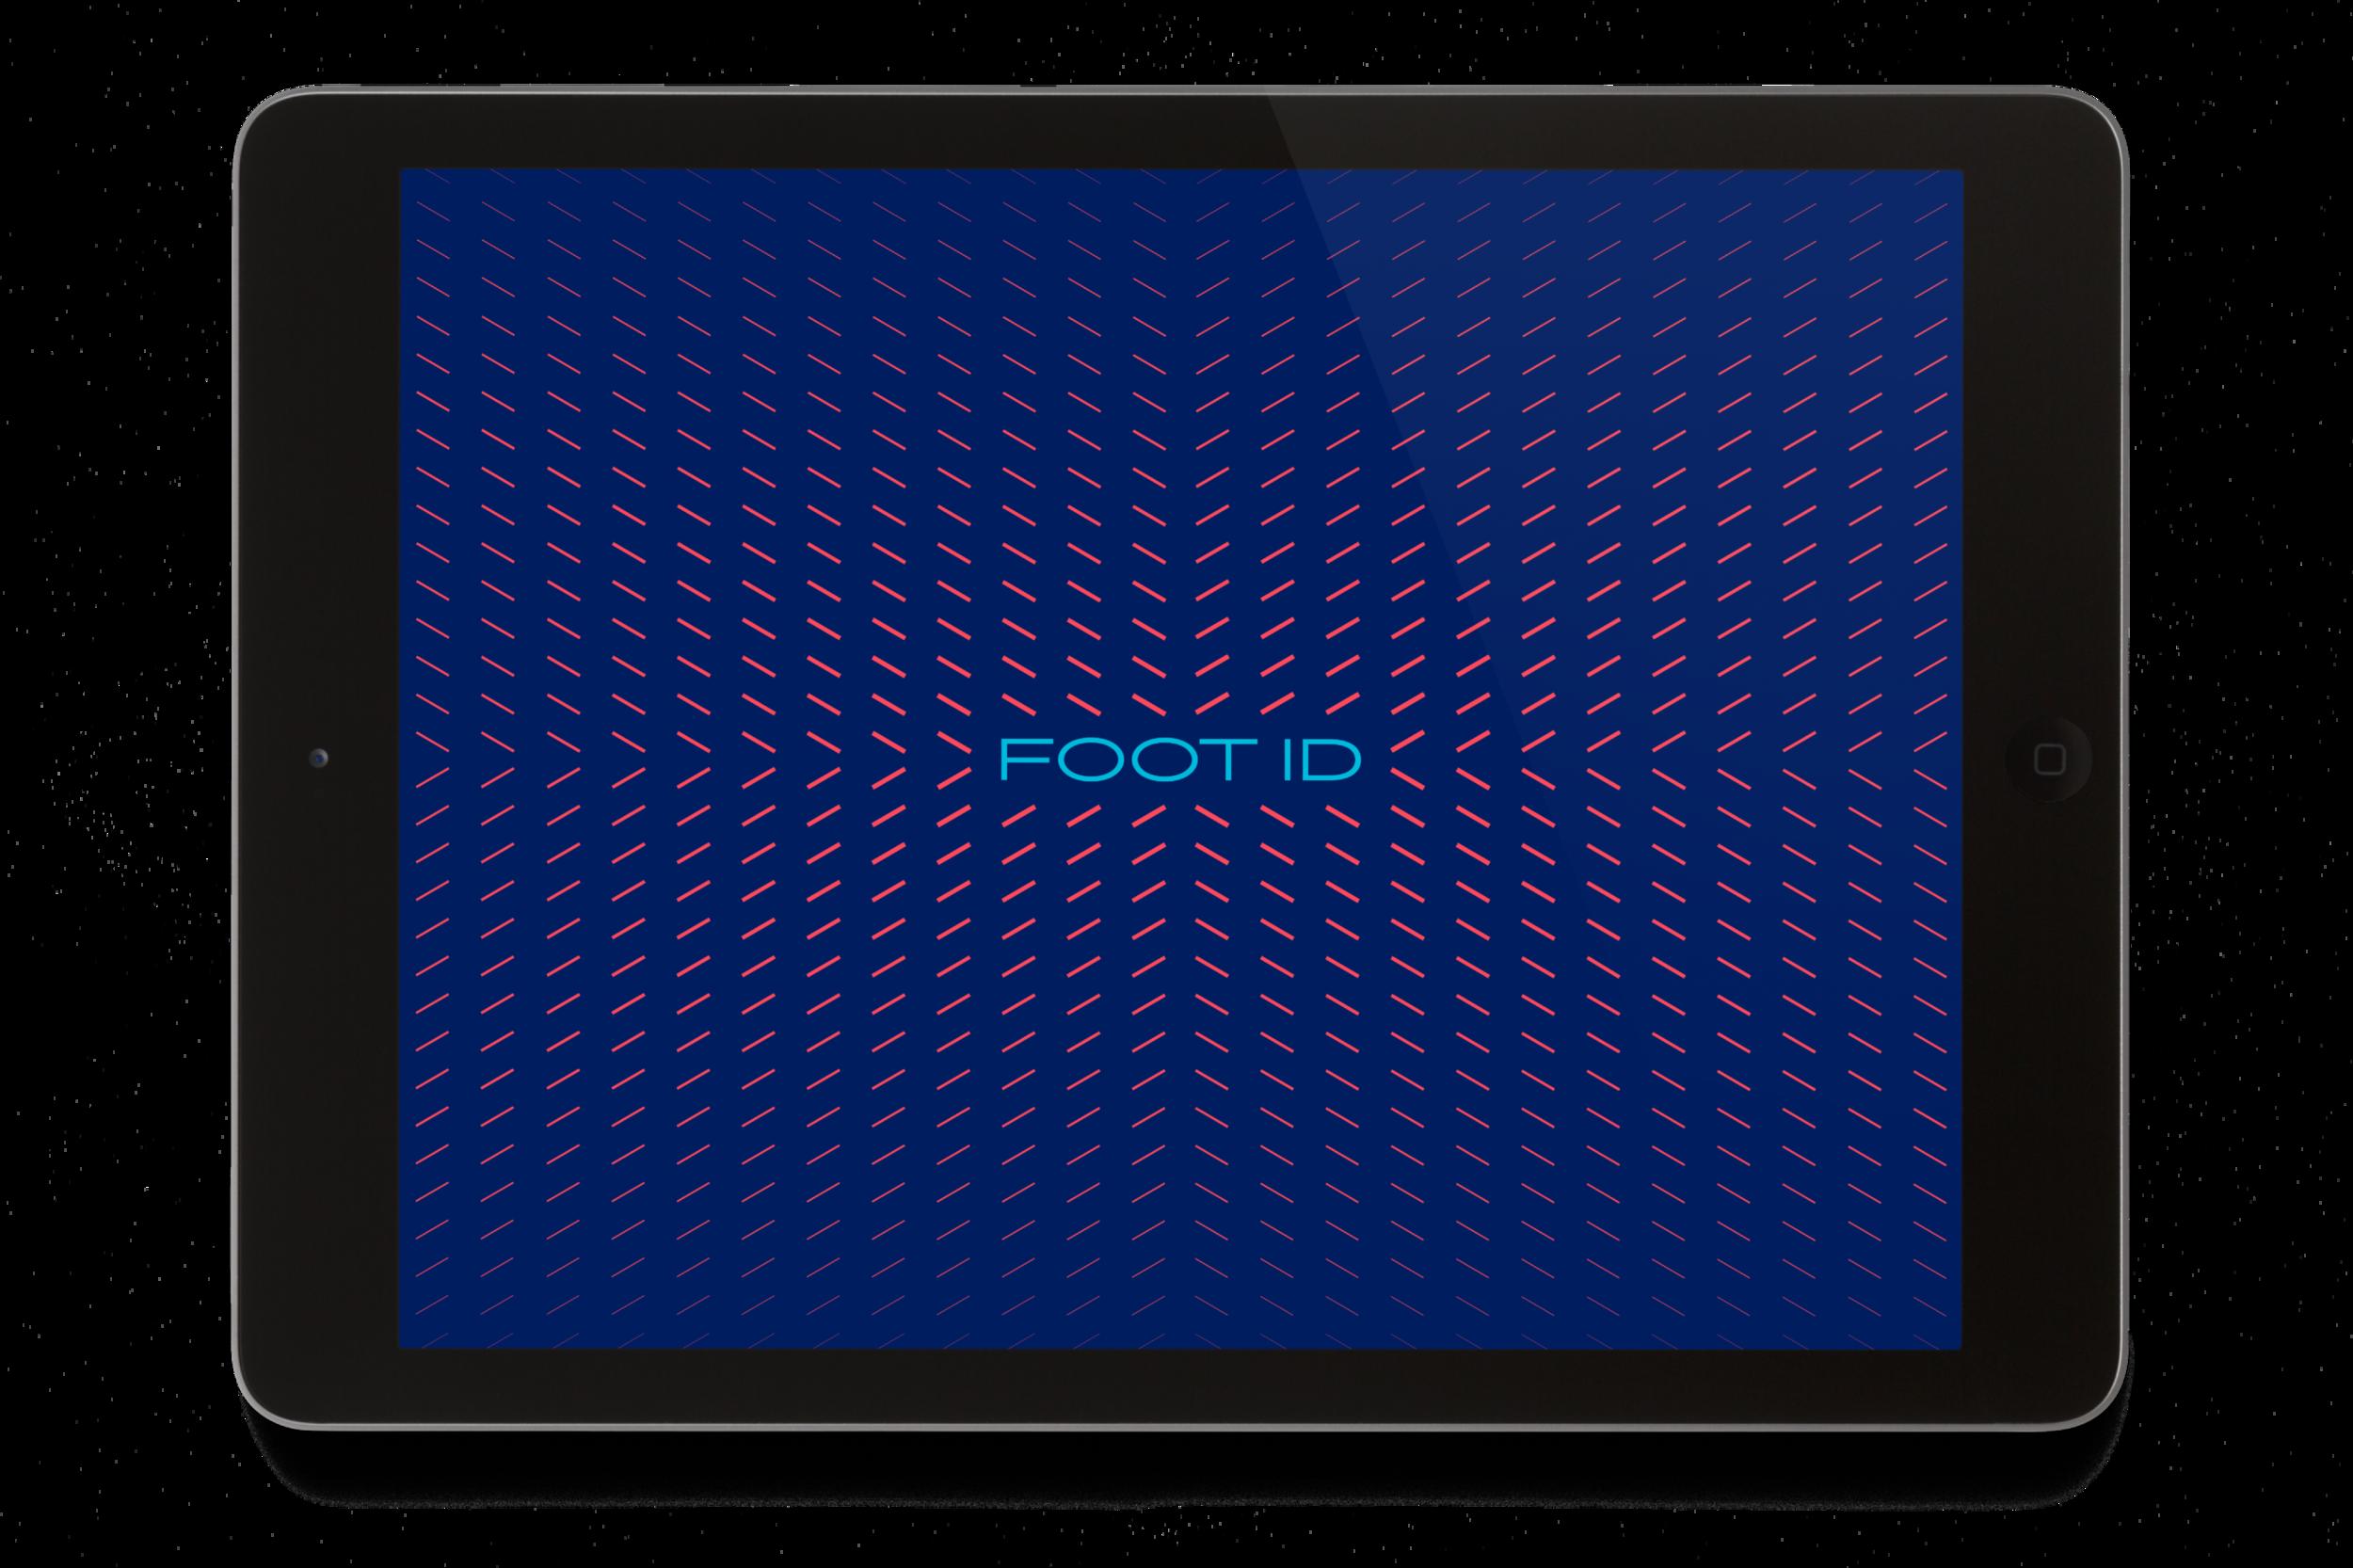 Display 0649-10 2017-07-27.png